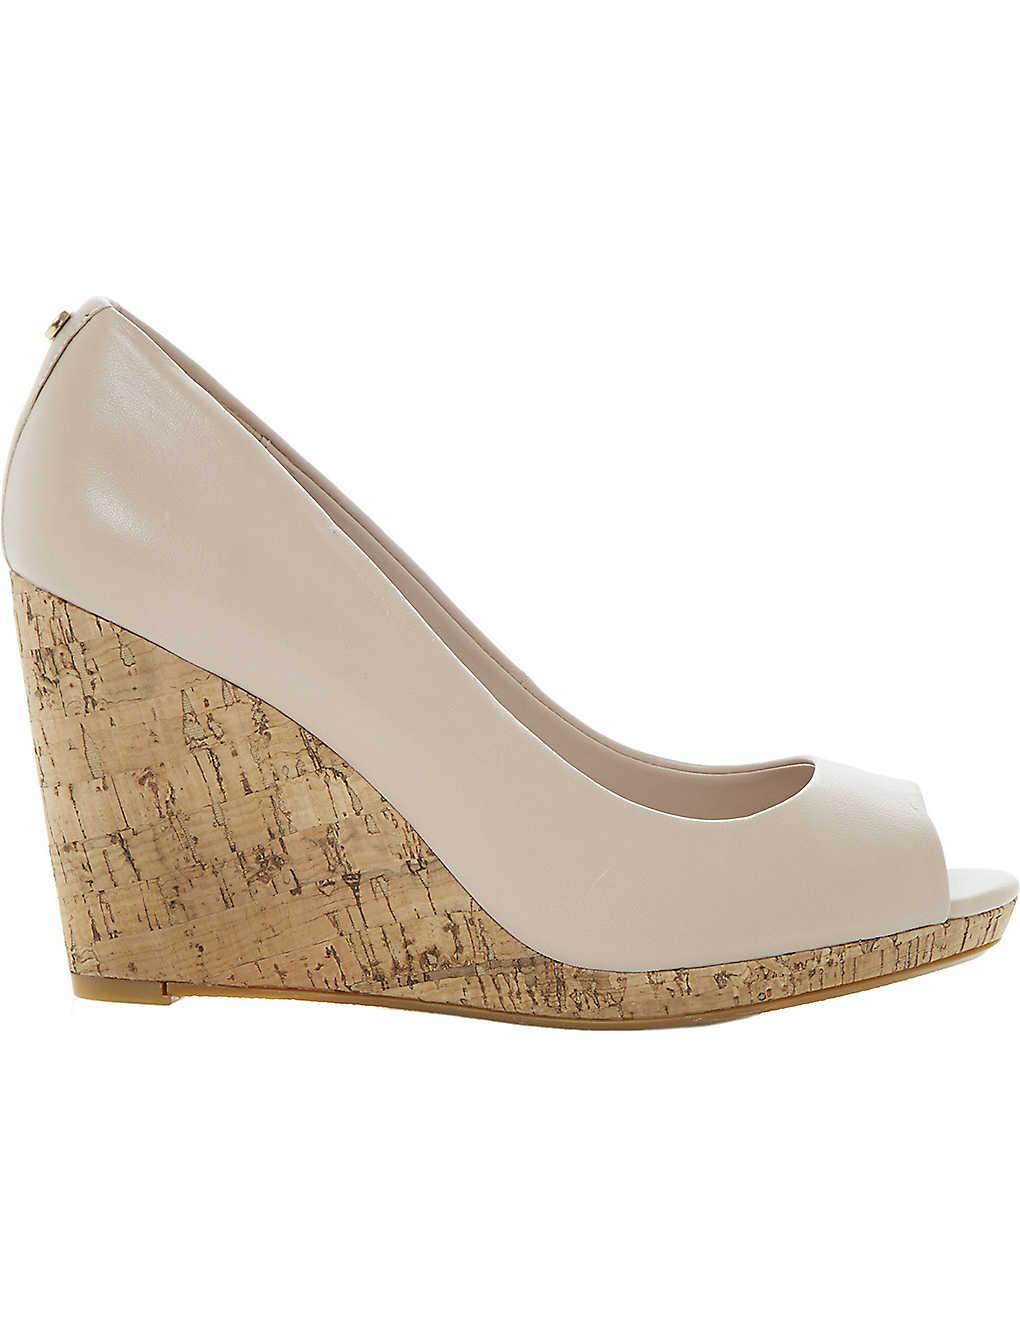 aecce8c931ed DUNE - Celia cork-wedge court shoes